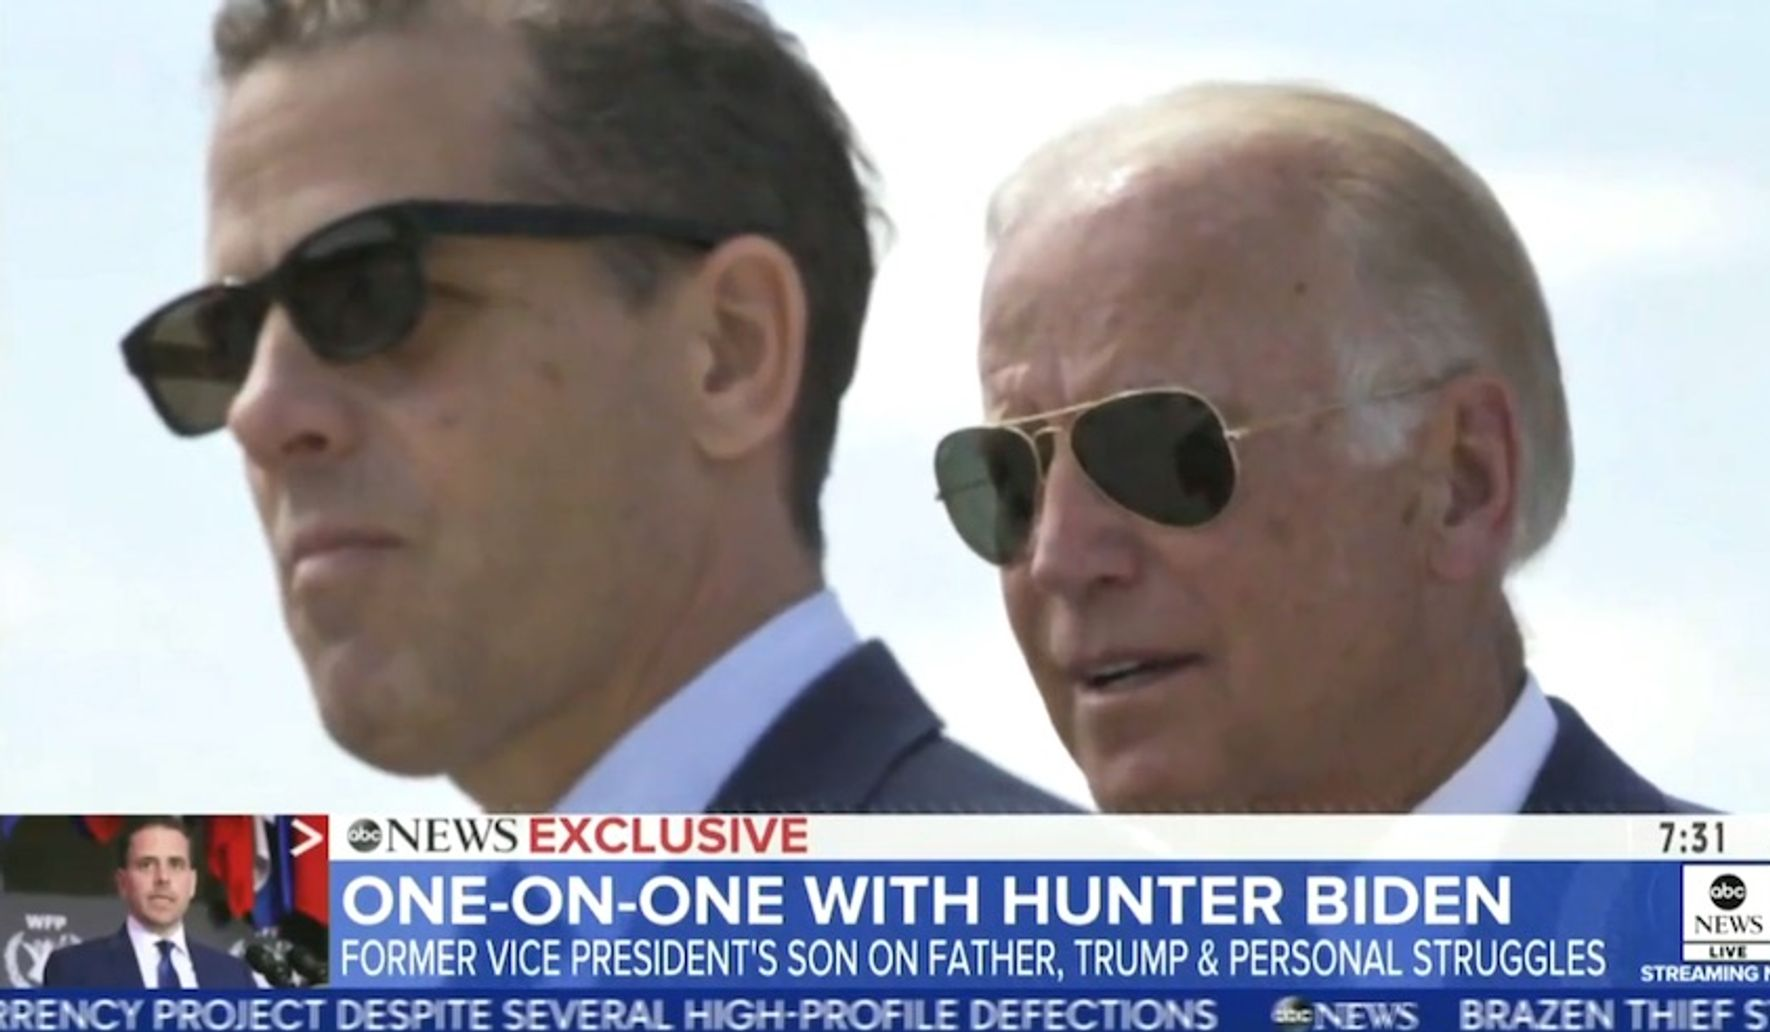 Hunter Biden blasts Trump kids as 'Barnum and Bailey' circus acts: 'This isn't real stuff'